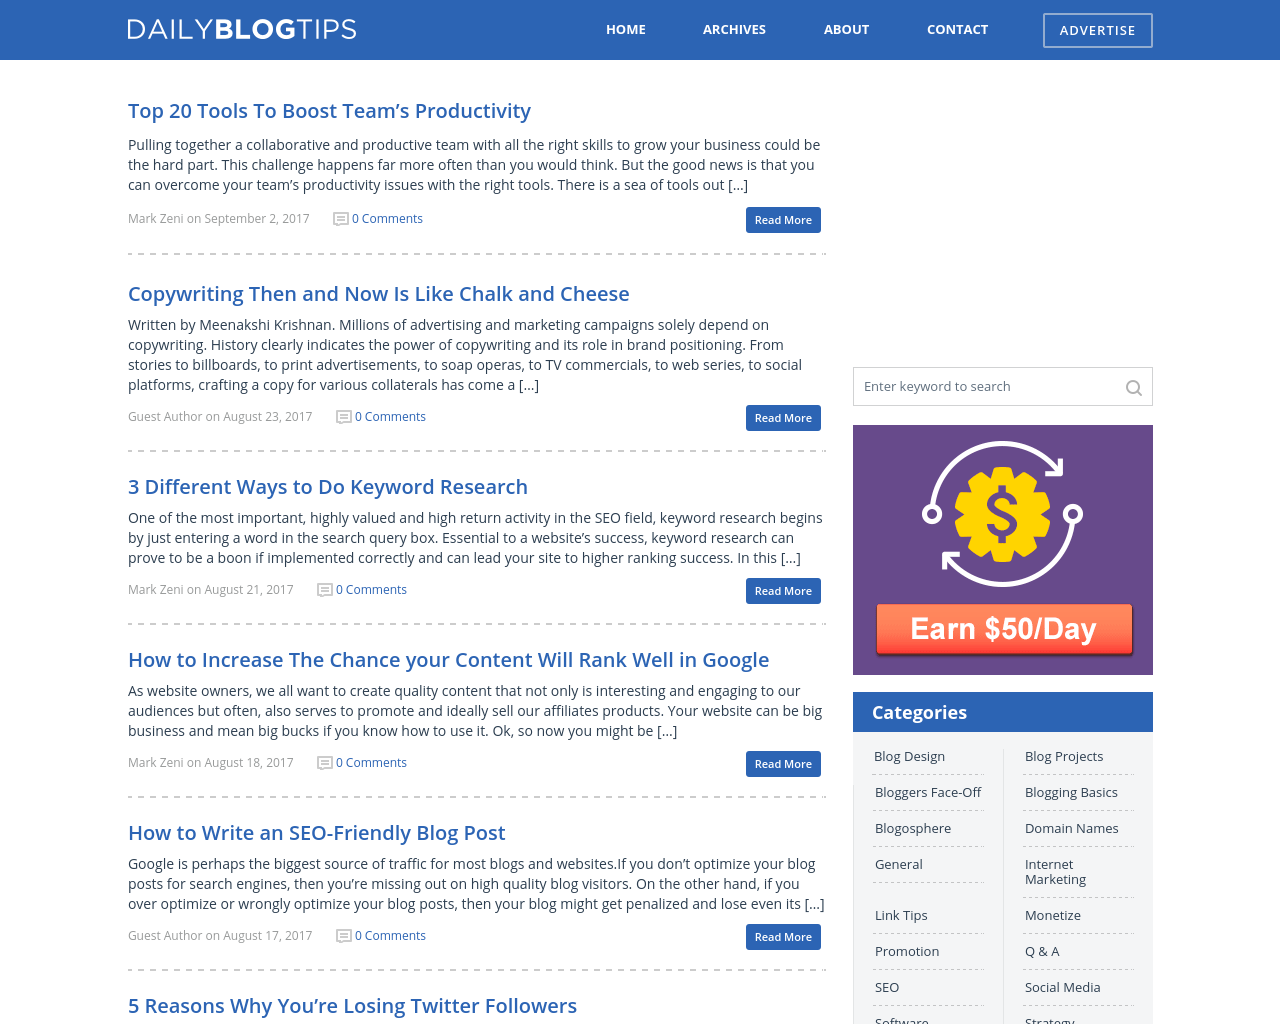 Daily-Blog-Tips-Advertising-Reviews-Pricing